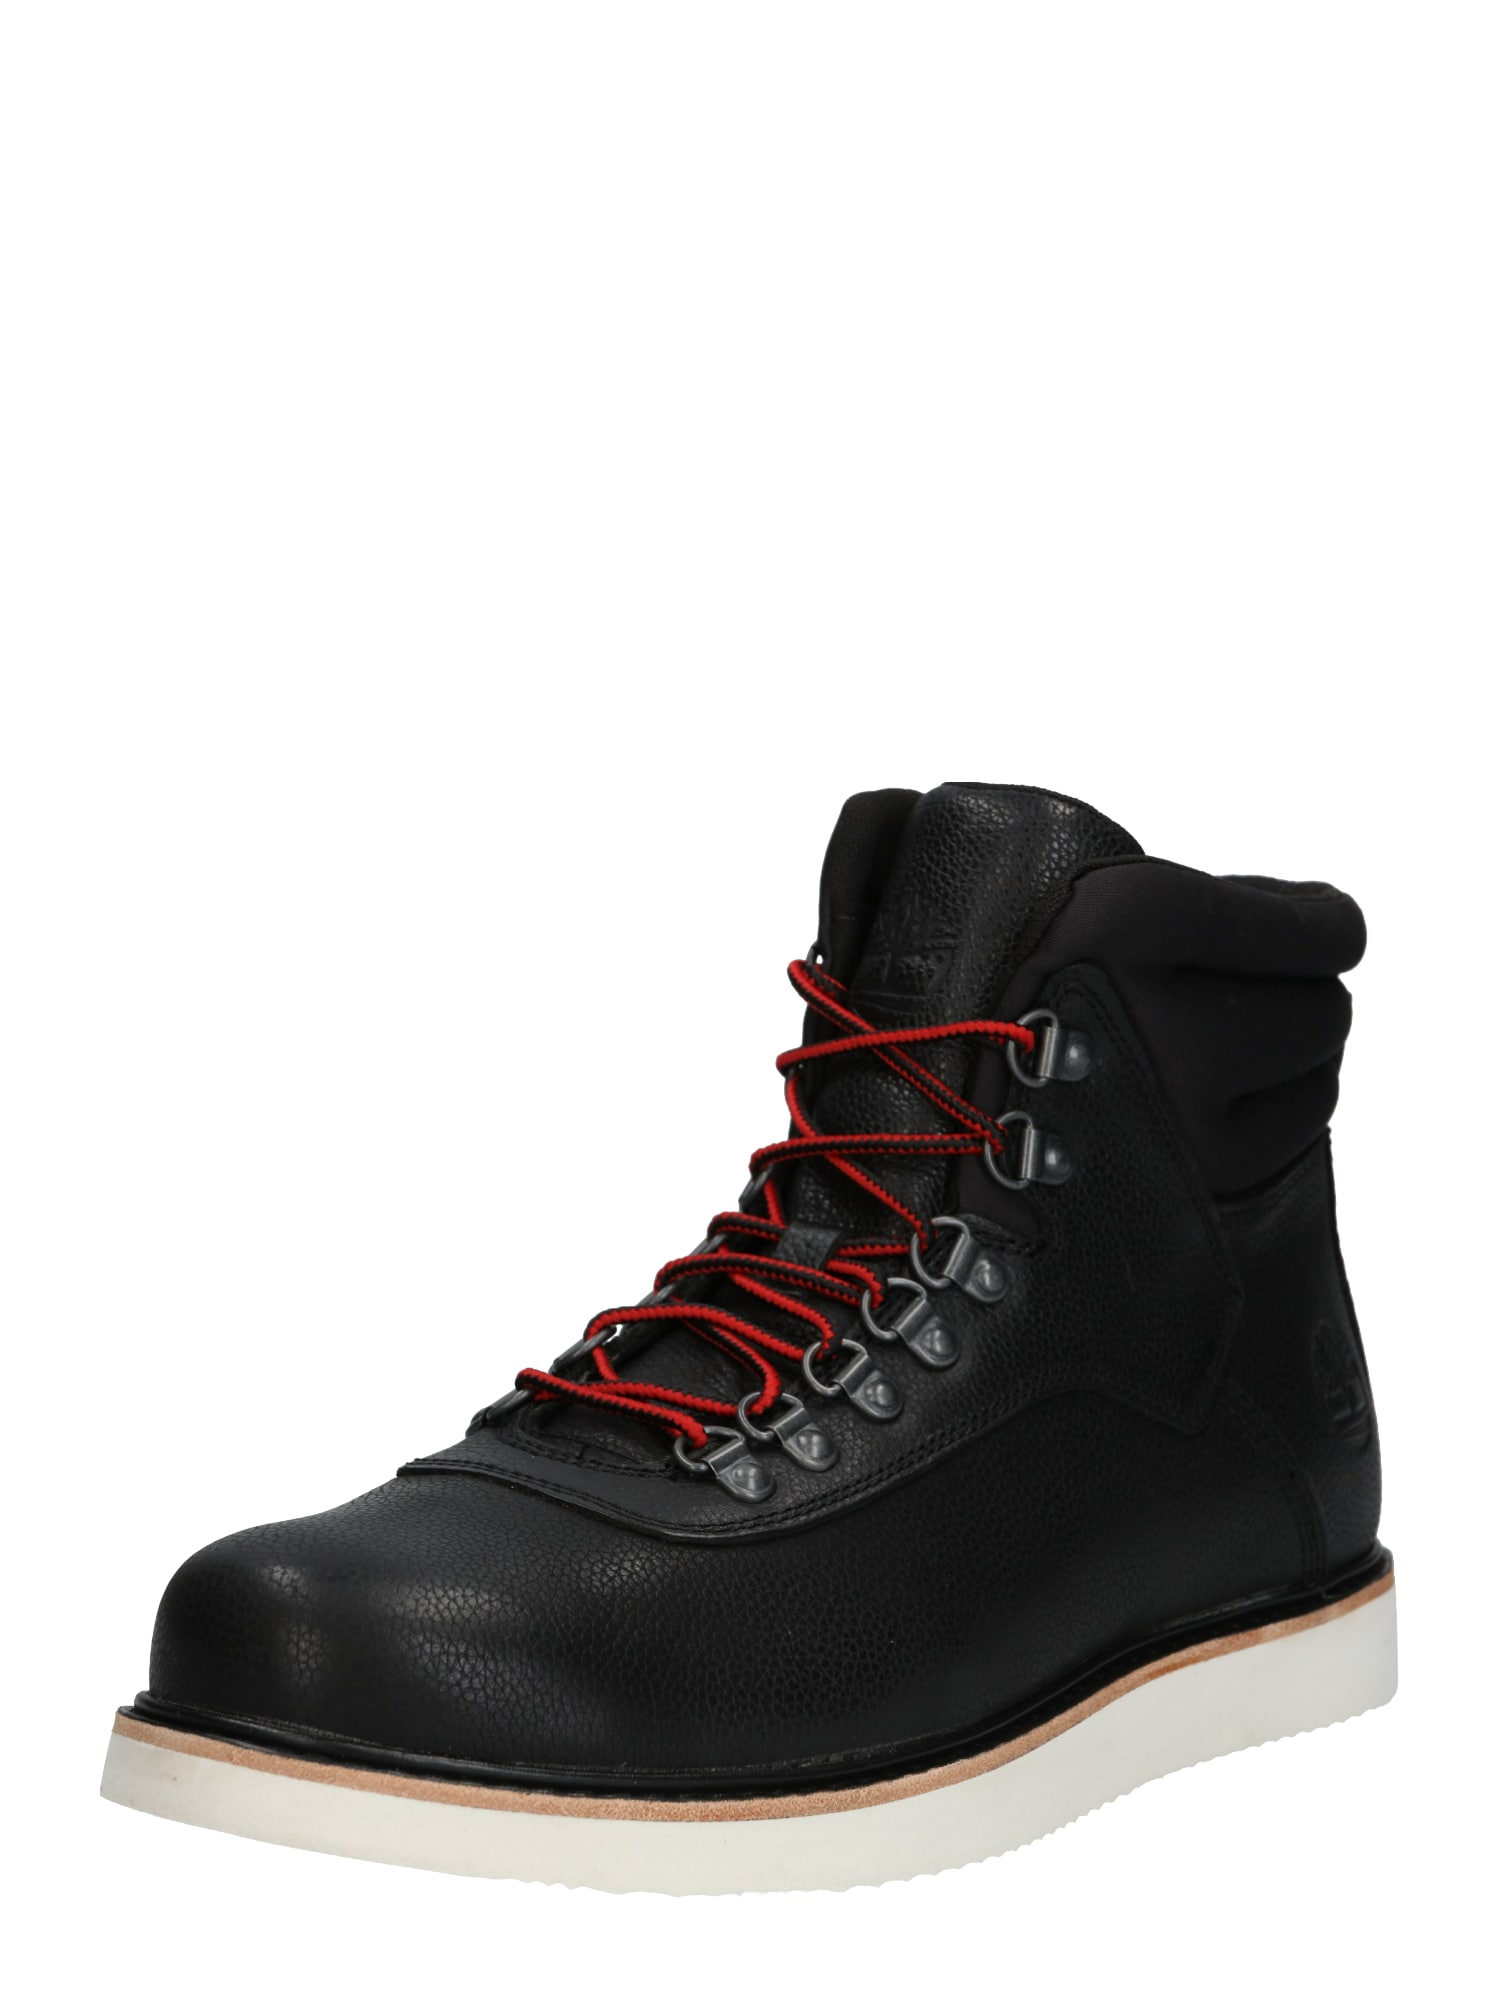 TIMBERLAND Šnurovacie čižmy 'Newmarket Archive Boot'  biela / čierna